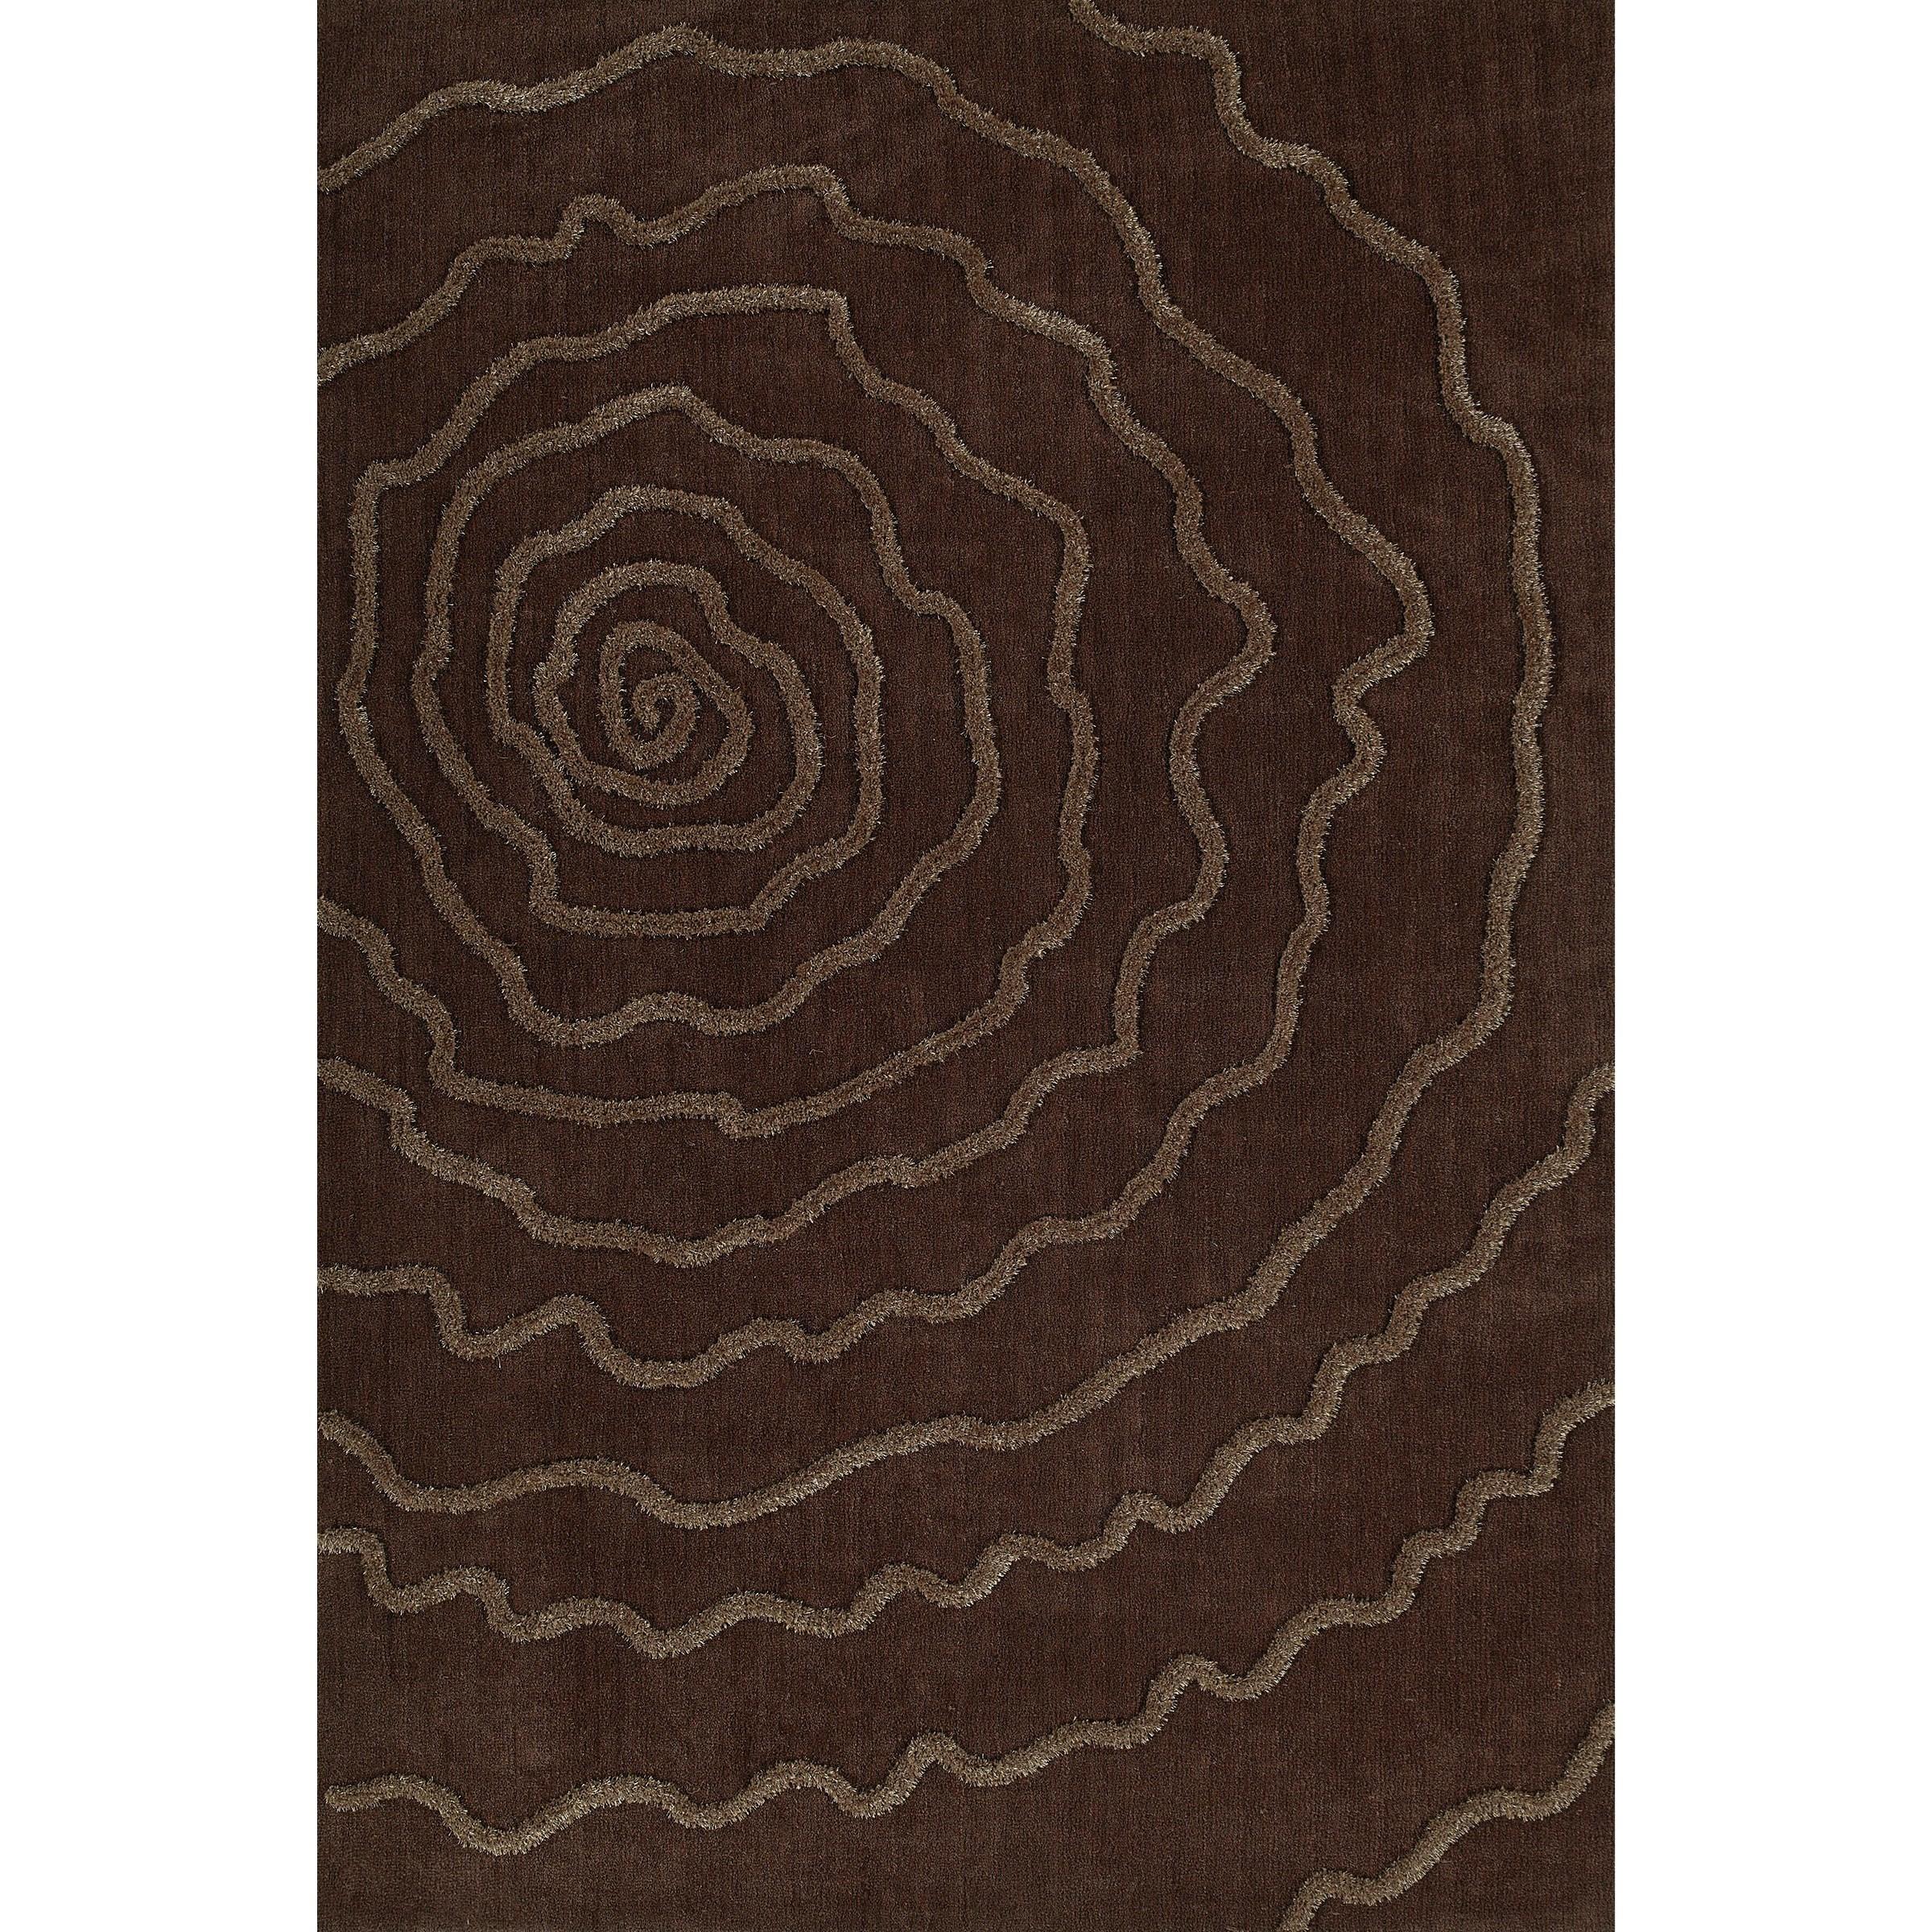 Chocolate 8'X10' Area Rug